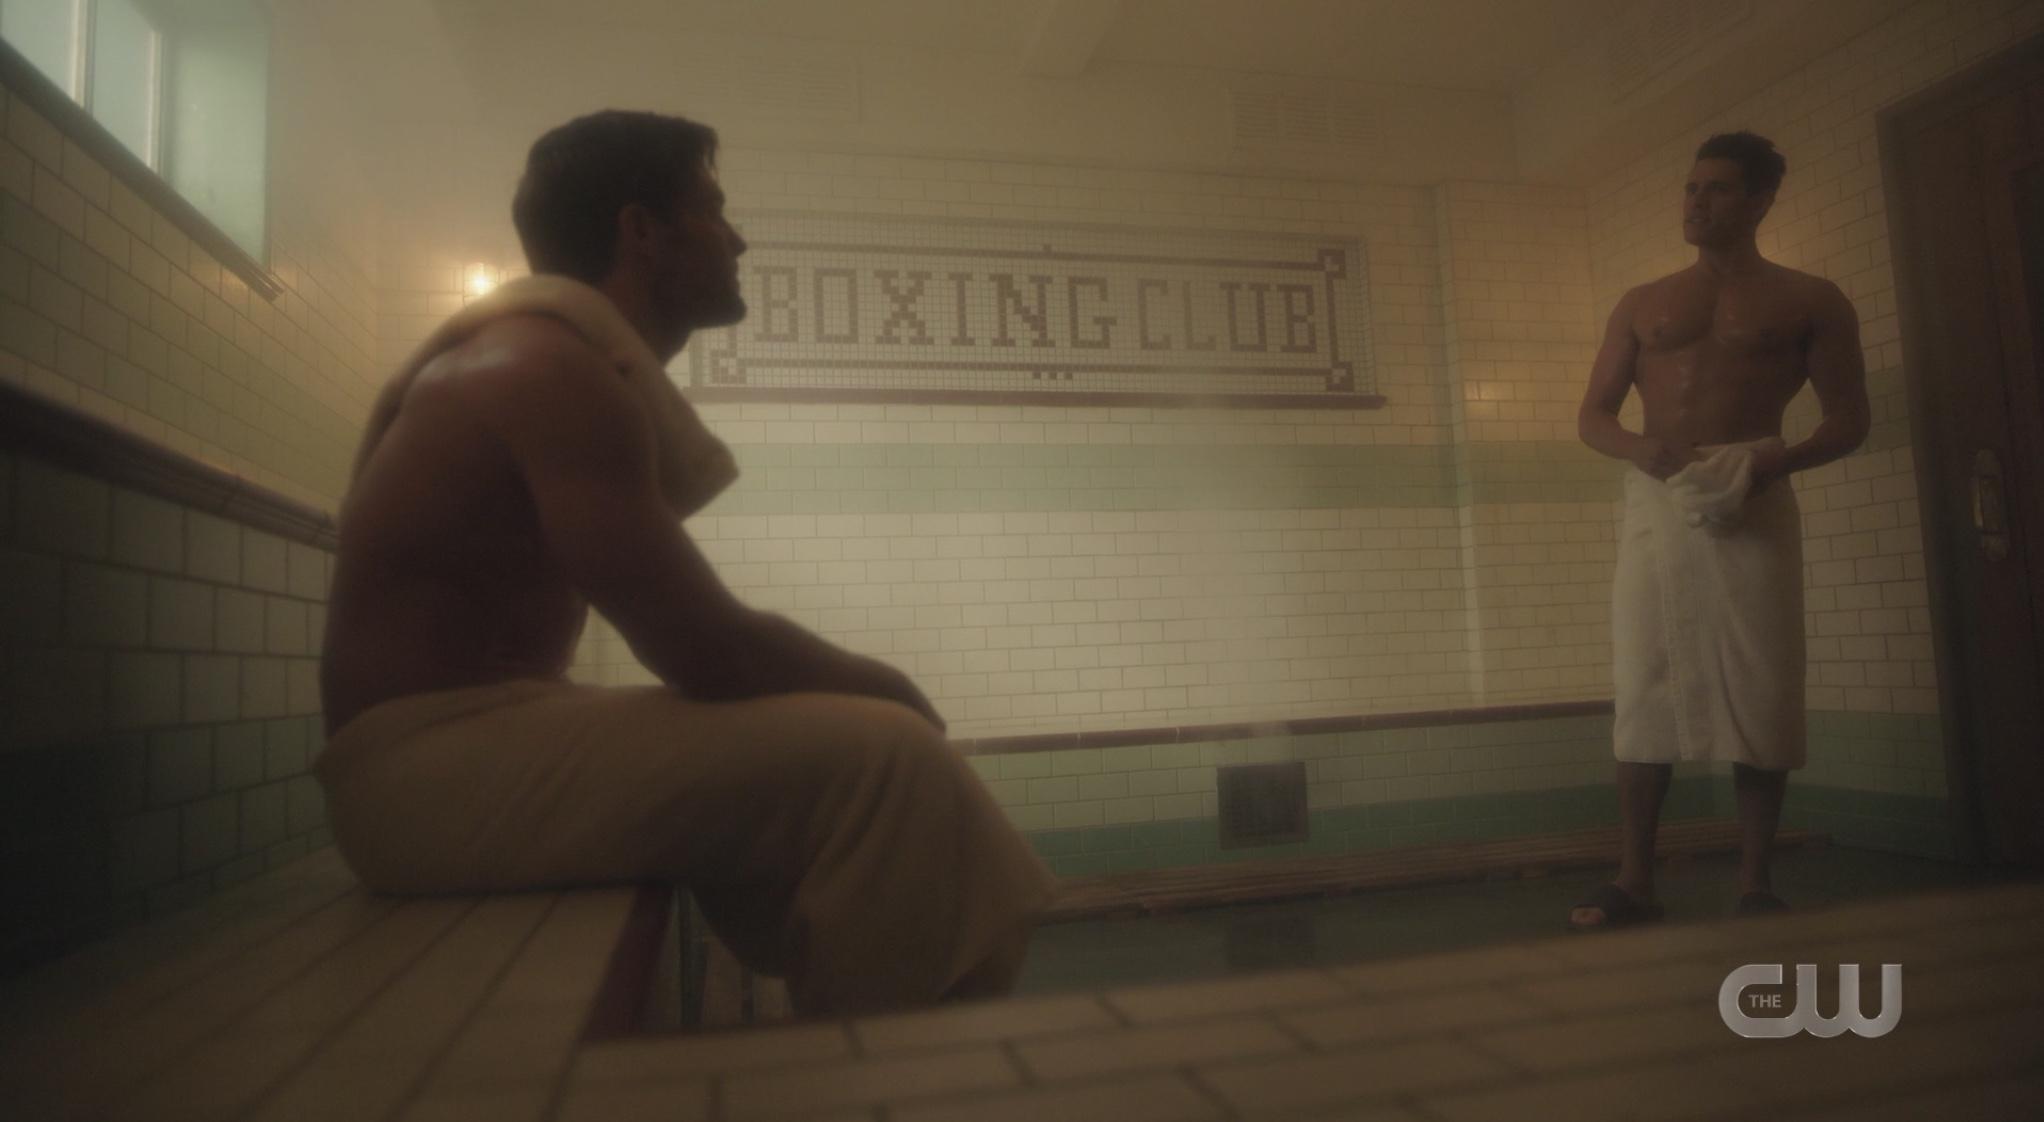 Kevin's second favorite hookup spot: Archie's gym